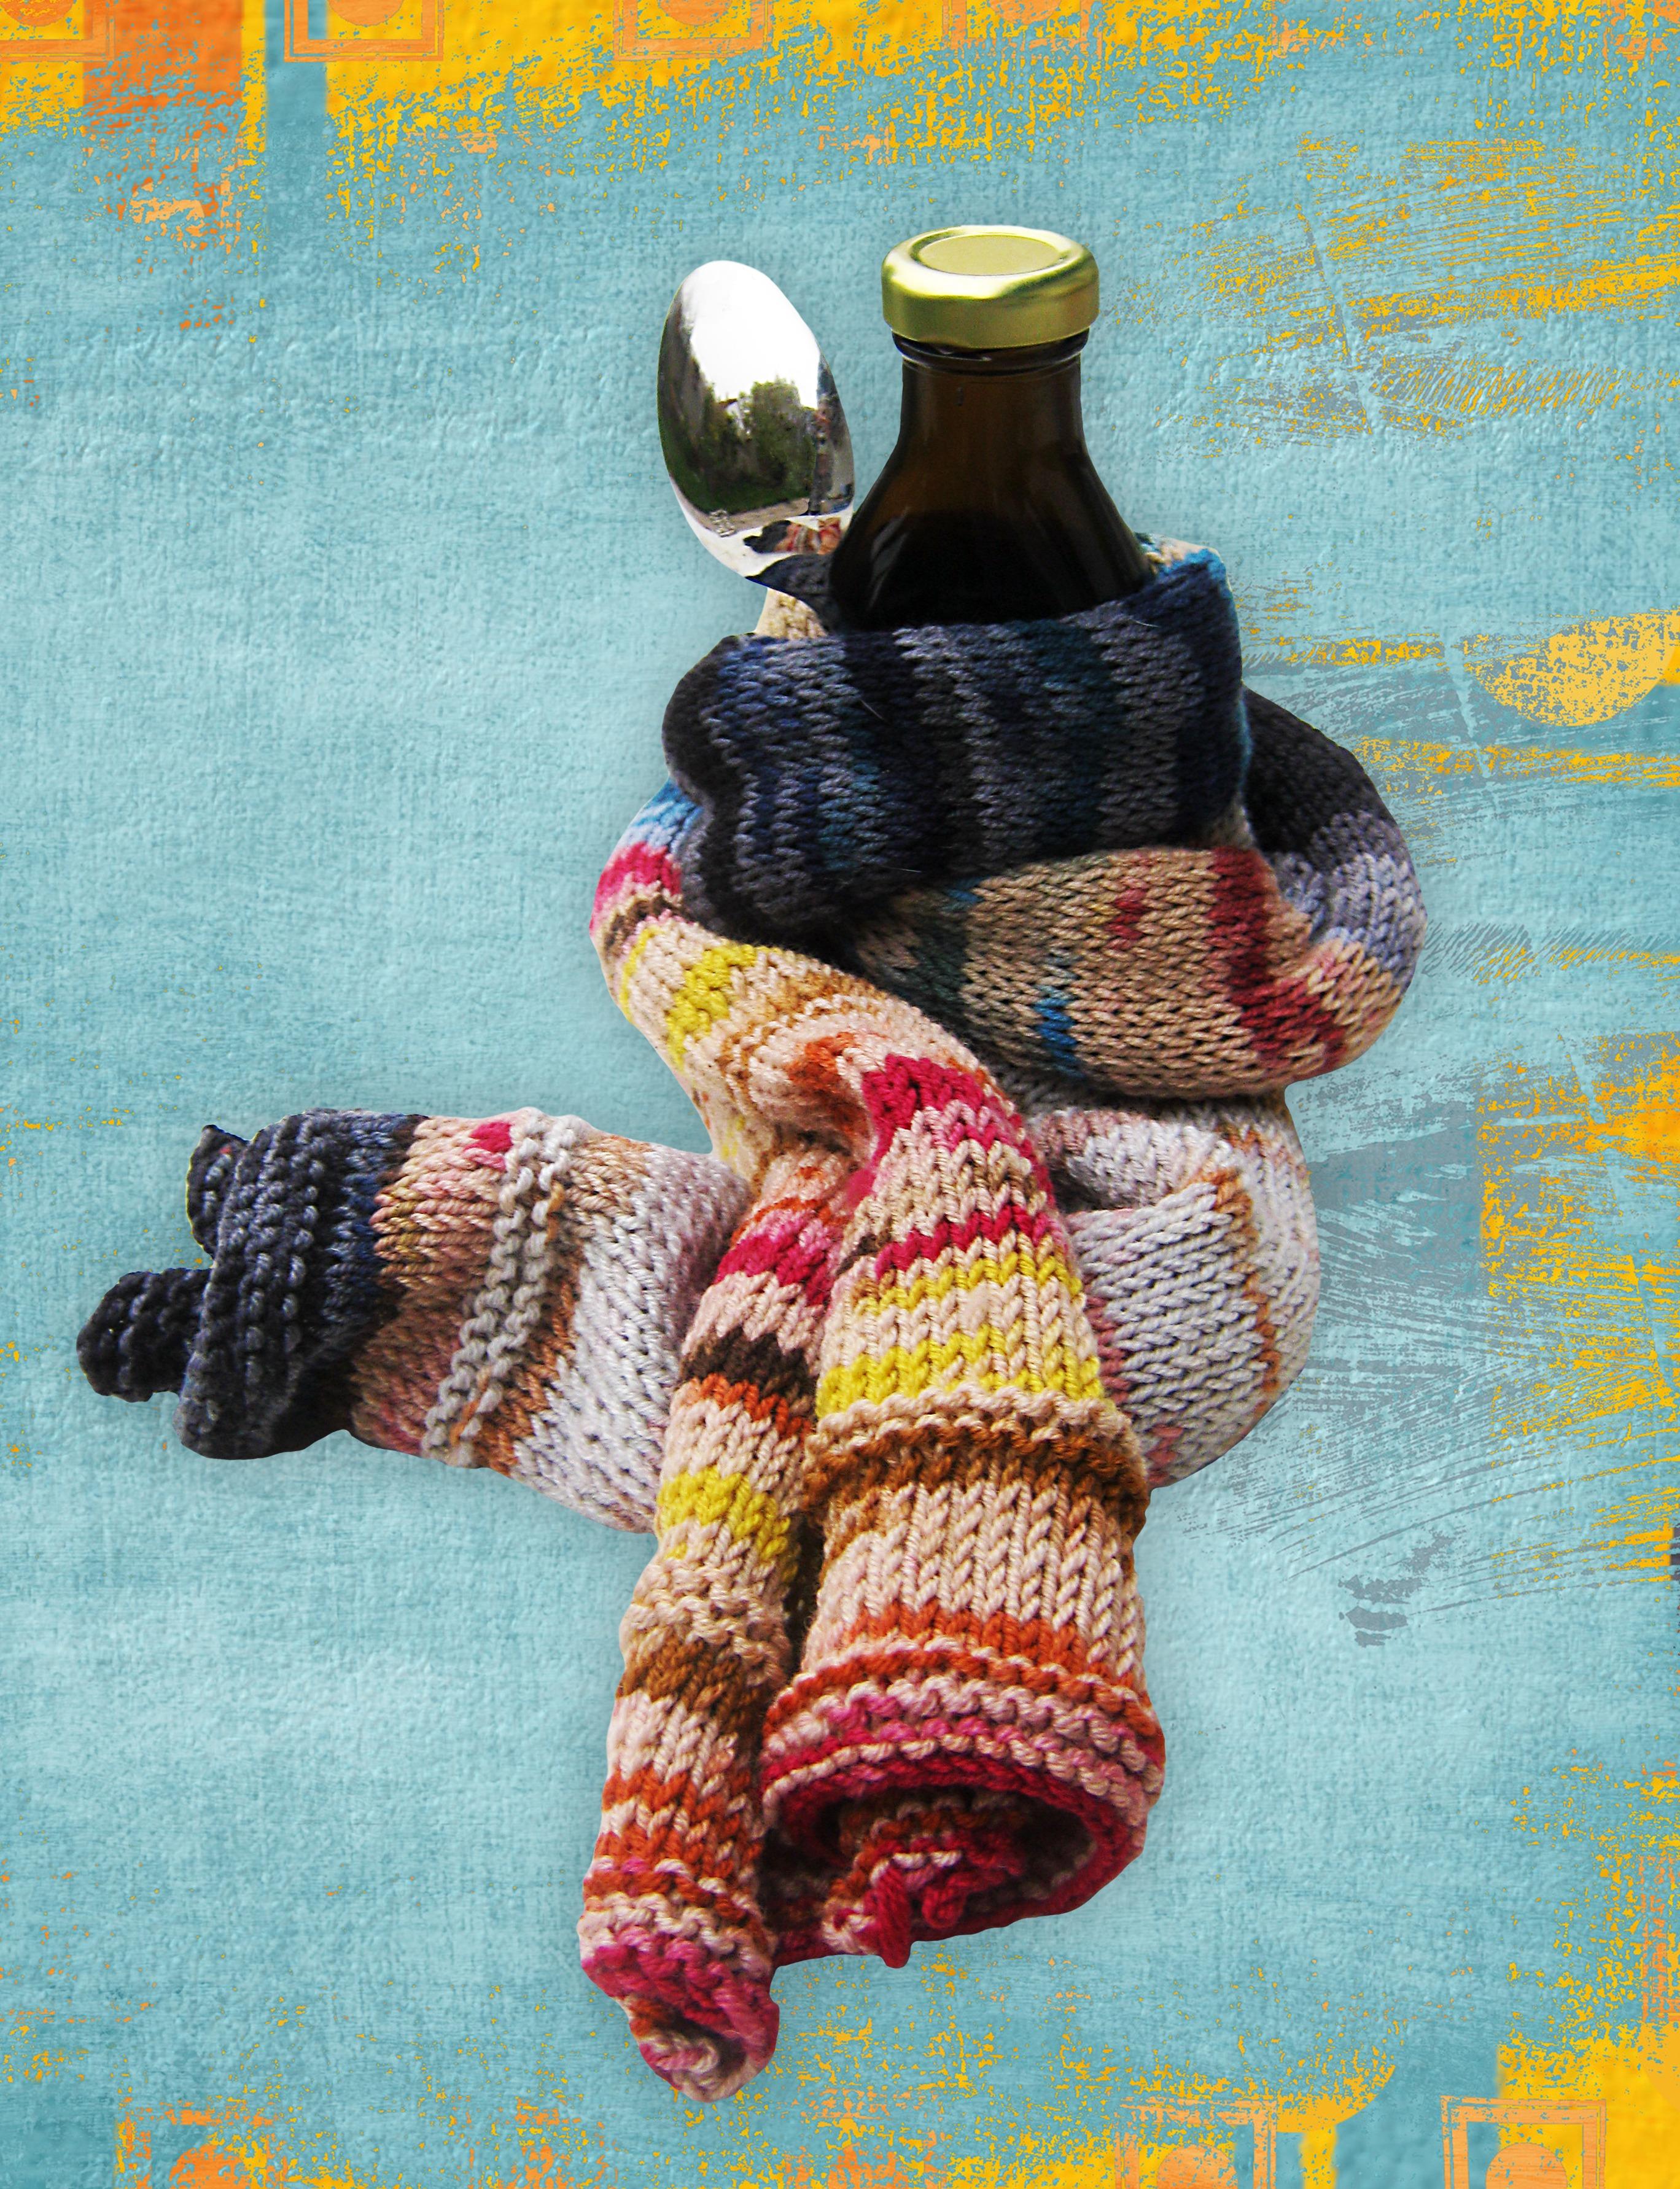 Kostenlose foto : kalt, Winter, Muster, Medizin, Spielzeug, Löffel ...